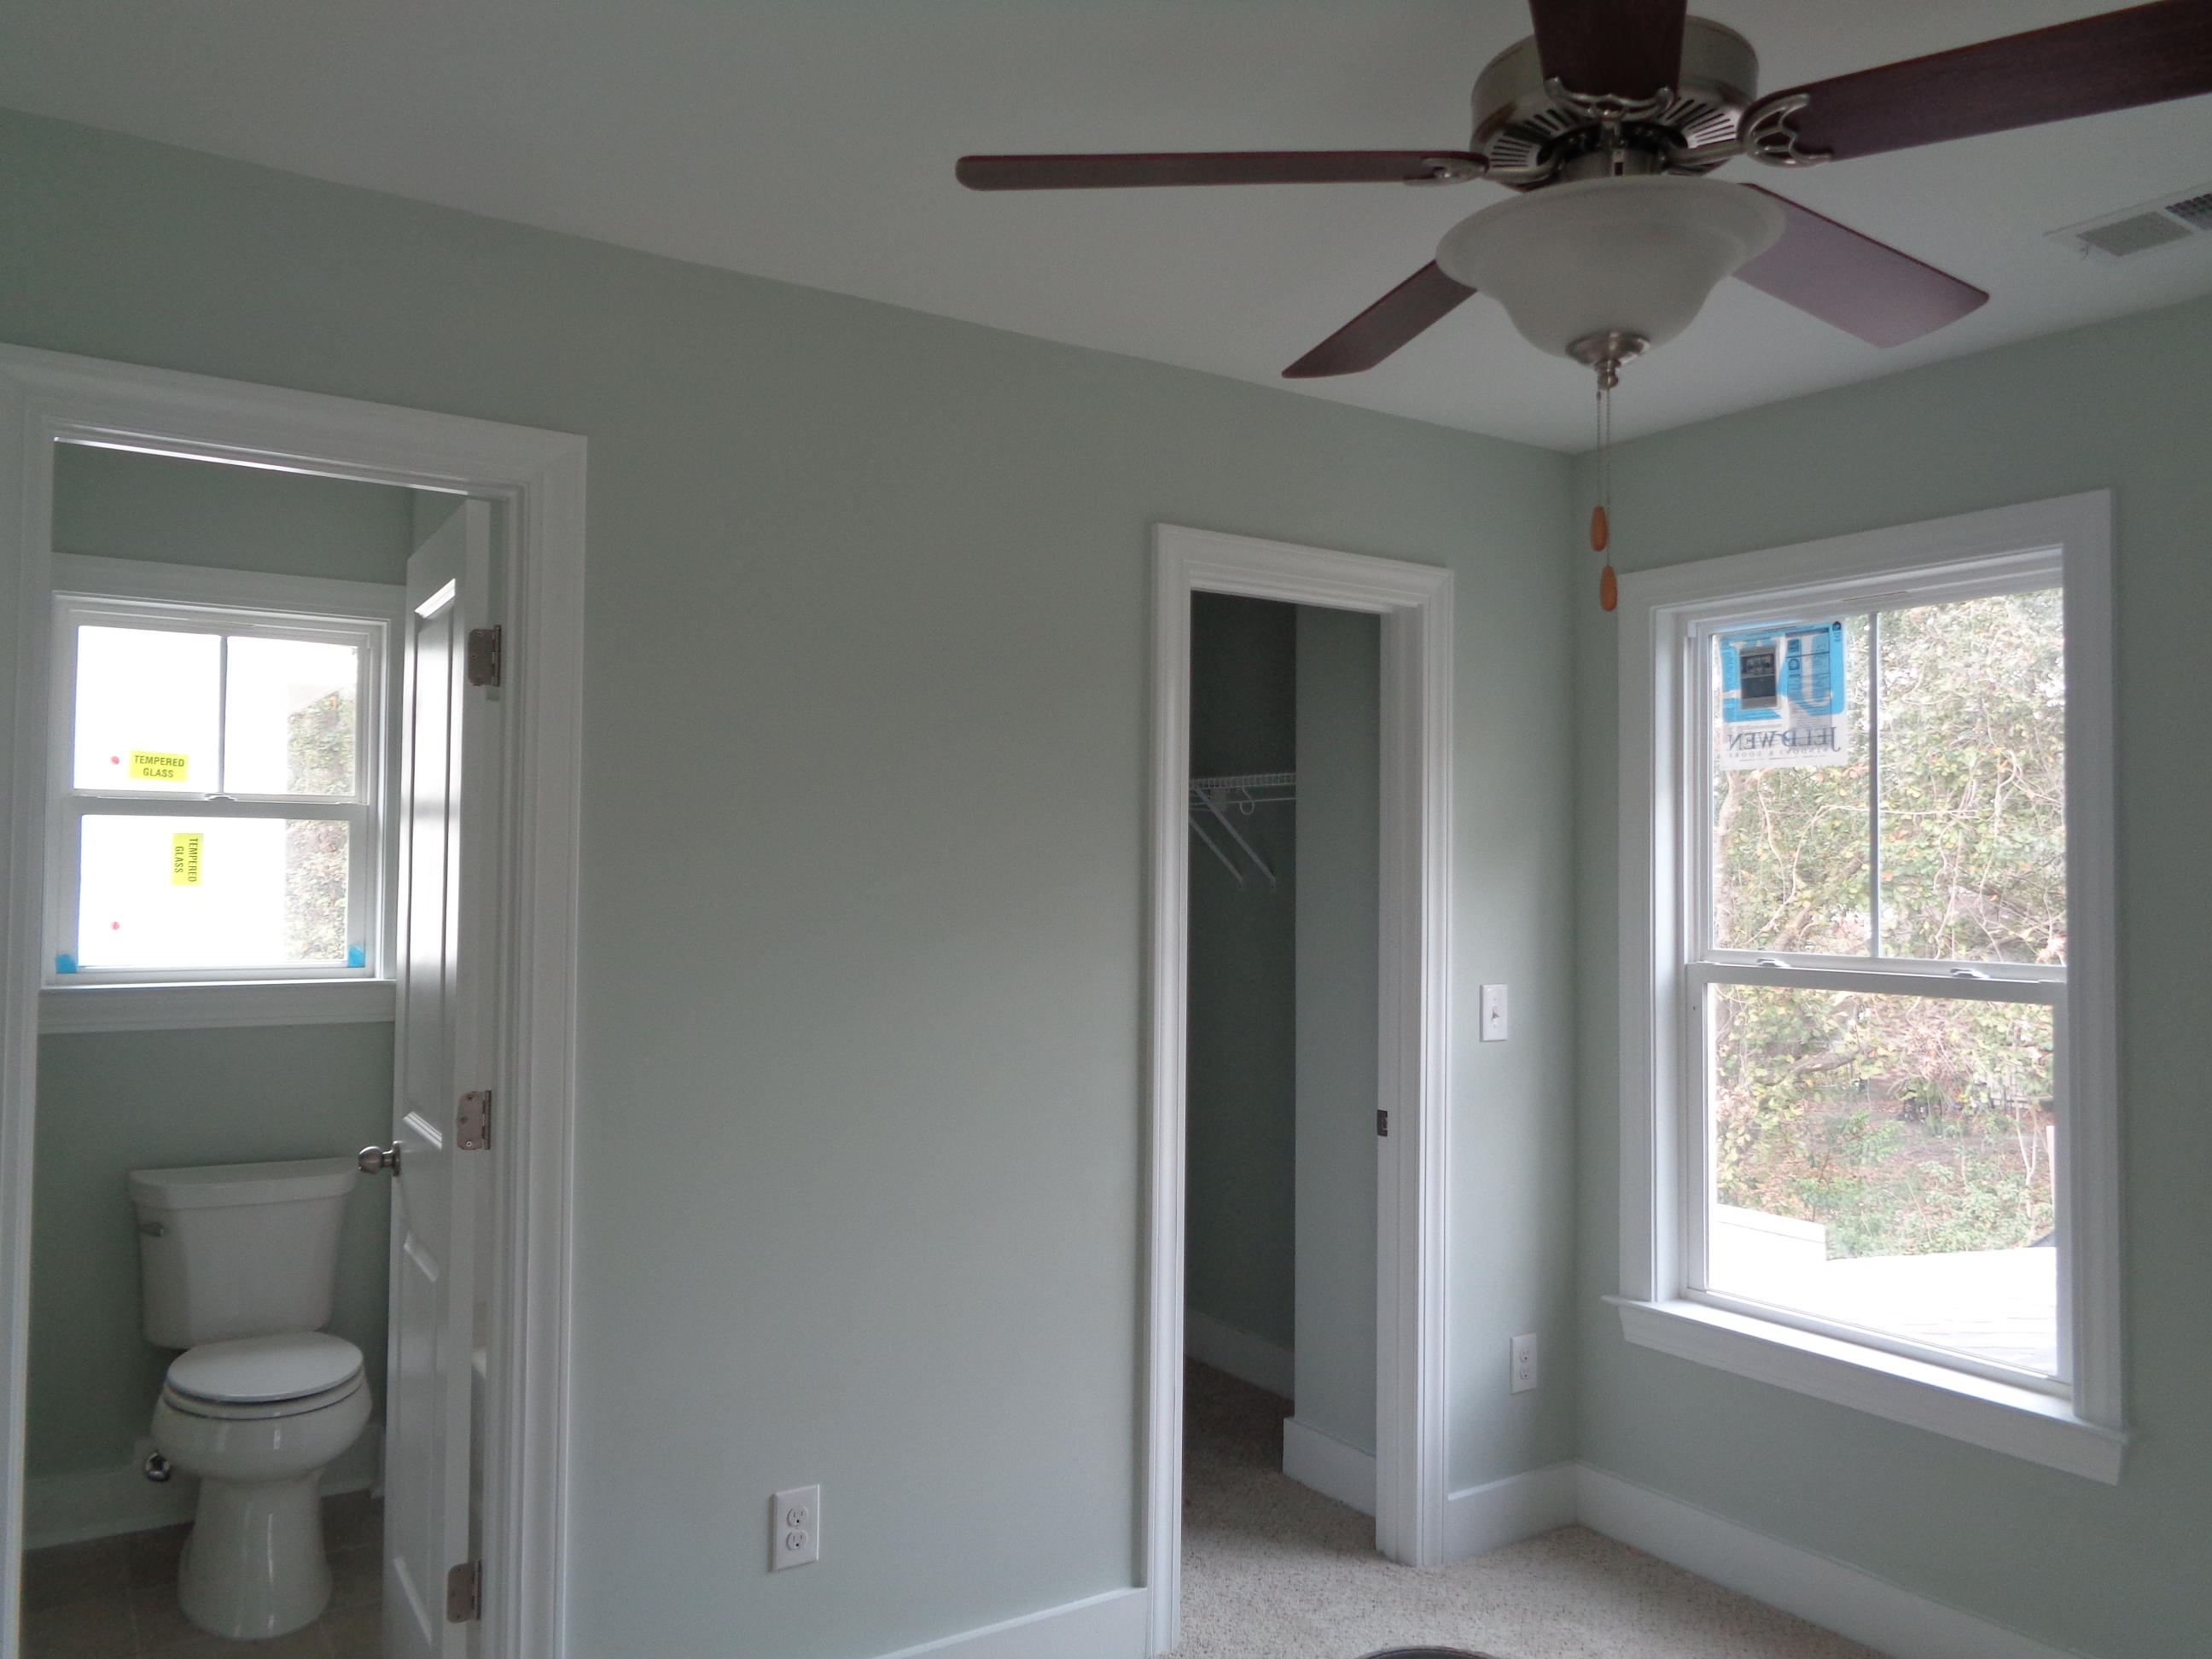 Pinecrest Gardens Homes For Sale - 1626 Wappoo, Charleston, SC - 16